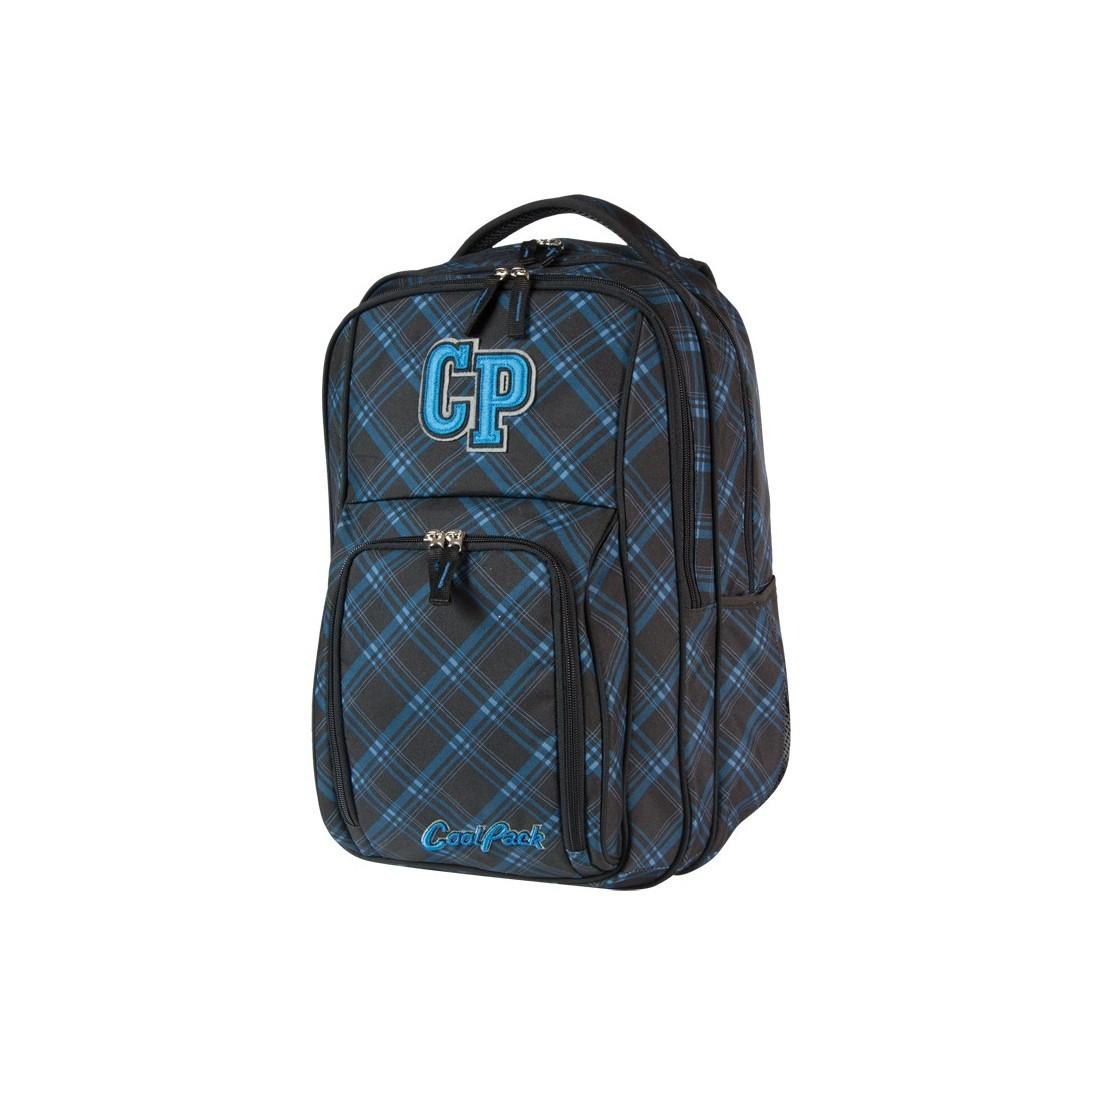 PLECAK MŁODZIEŻOWY COOLPACK SPLIT BLUE SHADOW CP 150 - plecak-tornister.pl